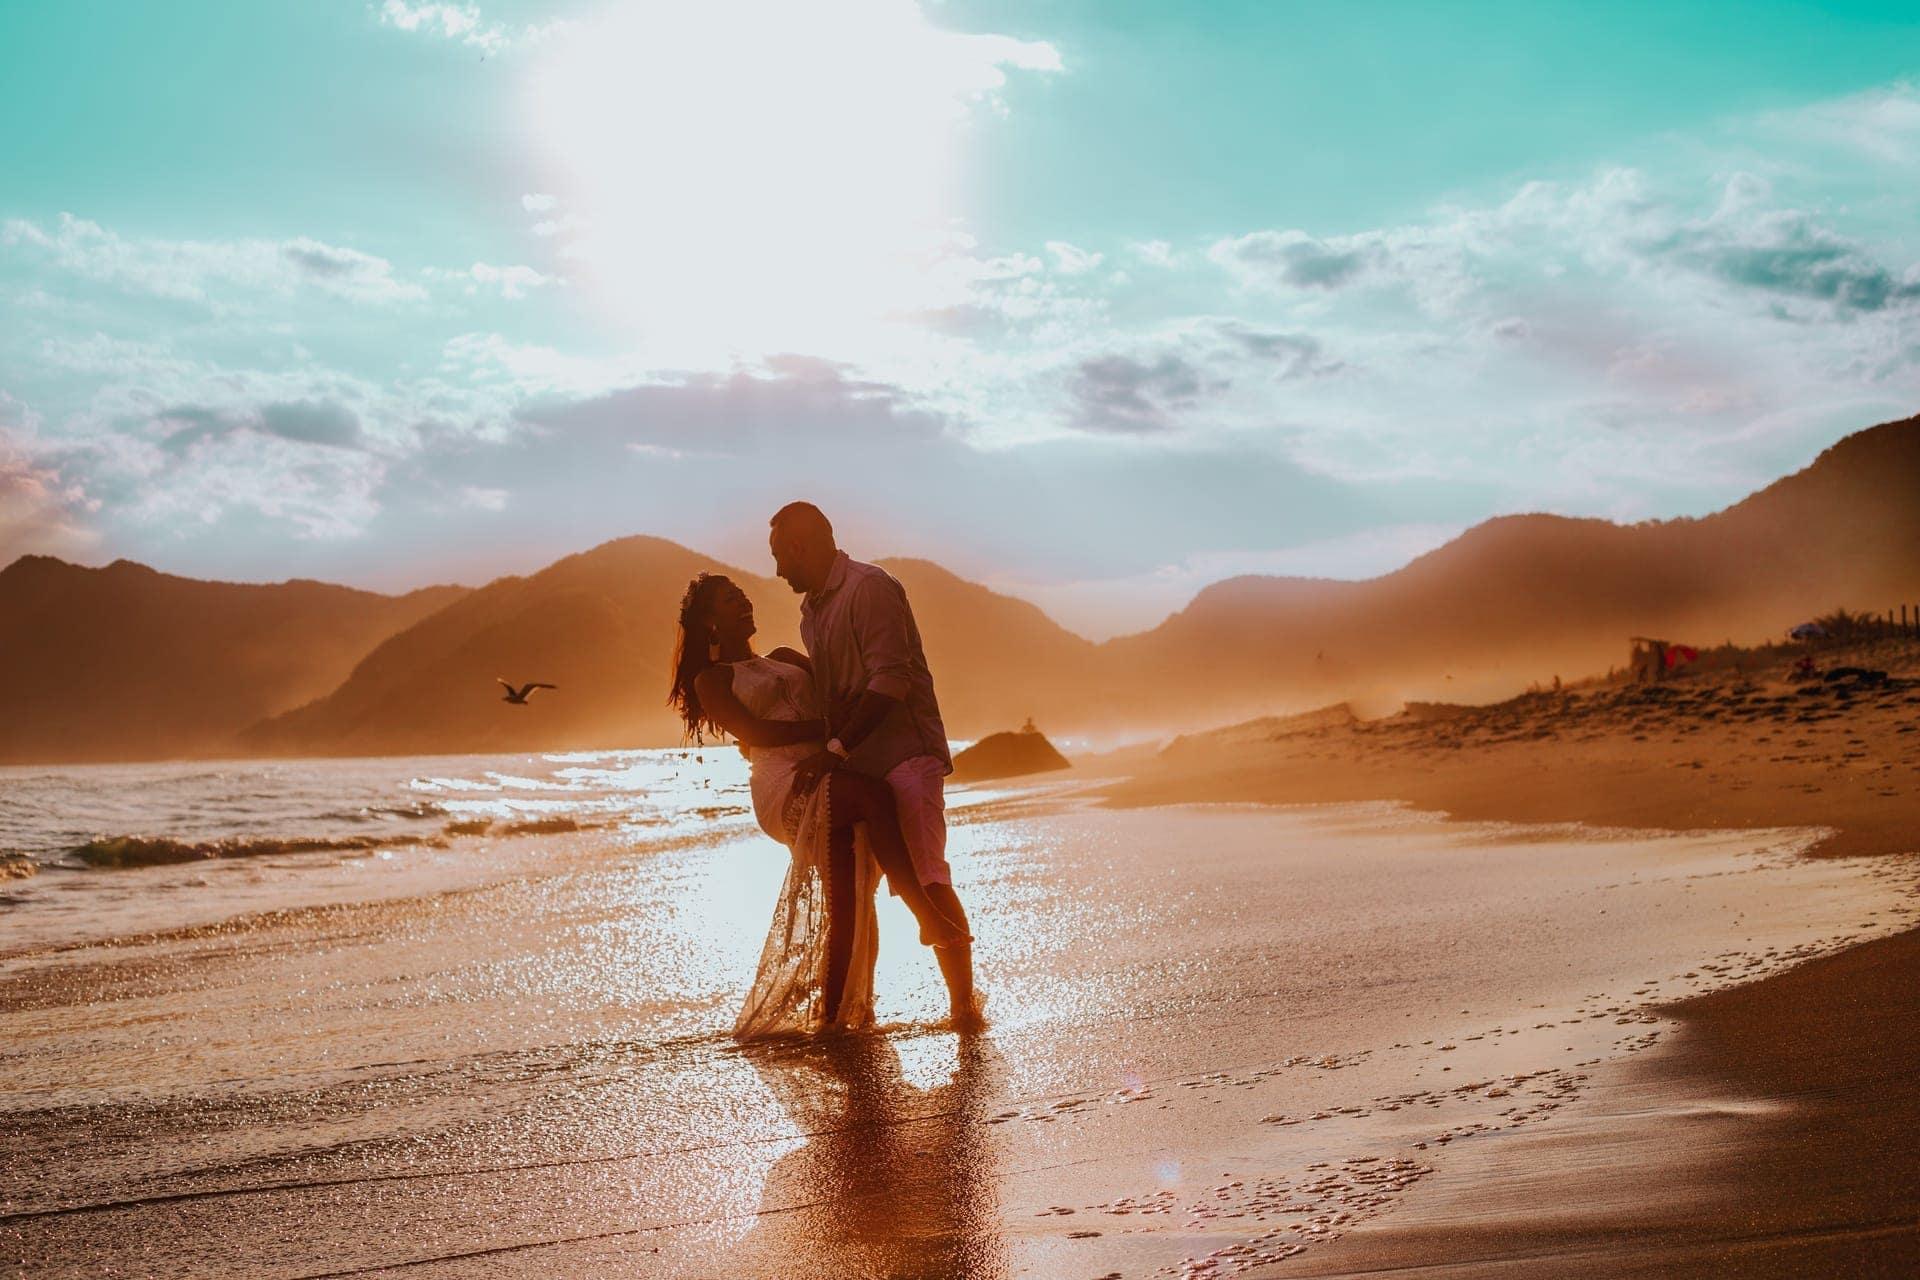 huwelijksreis strand bruiloft strandbruiloft honeymoon beach wedding